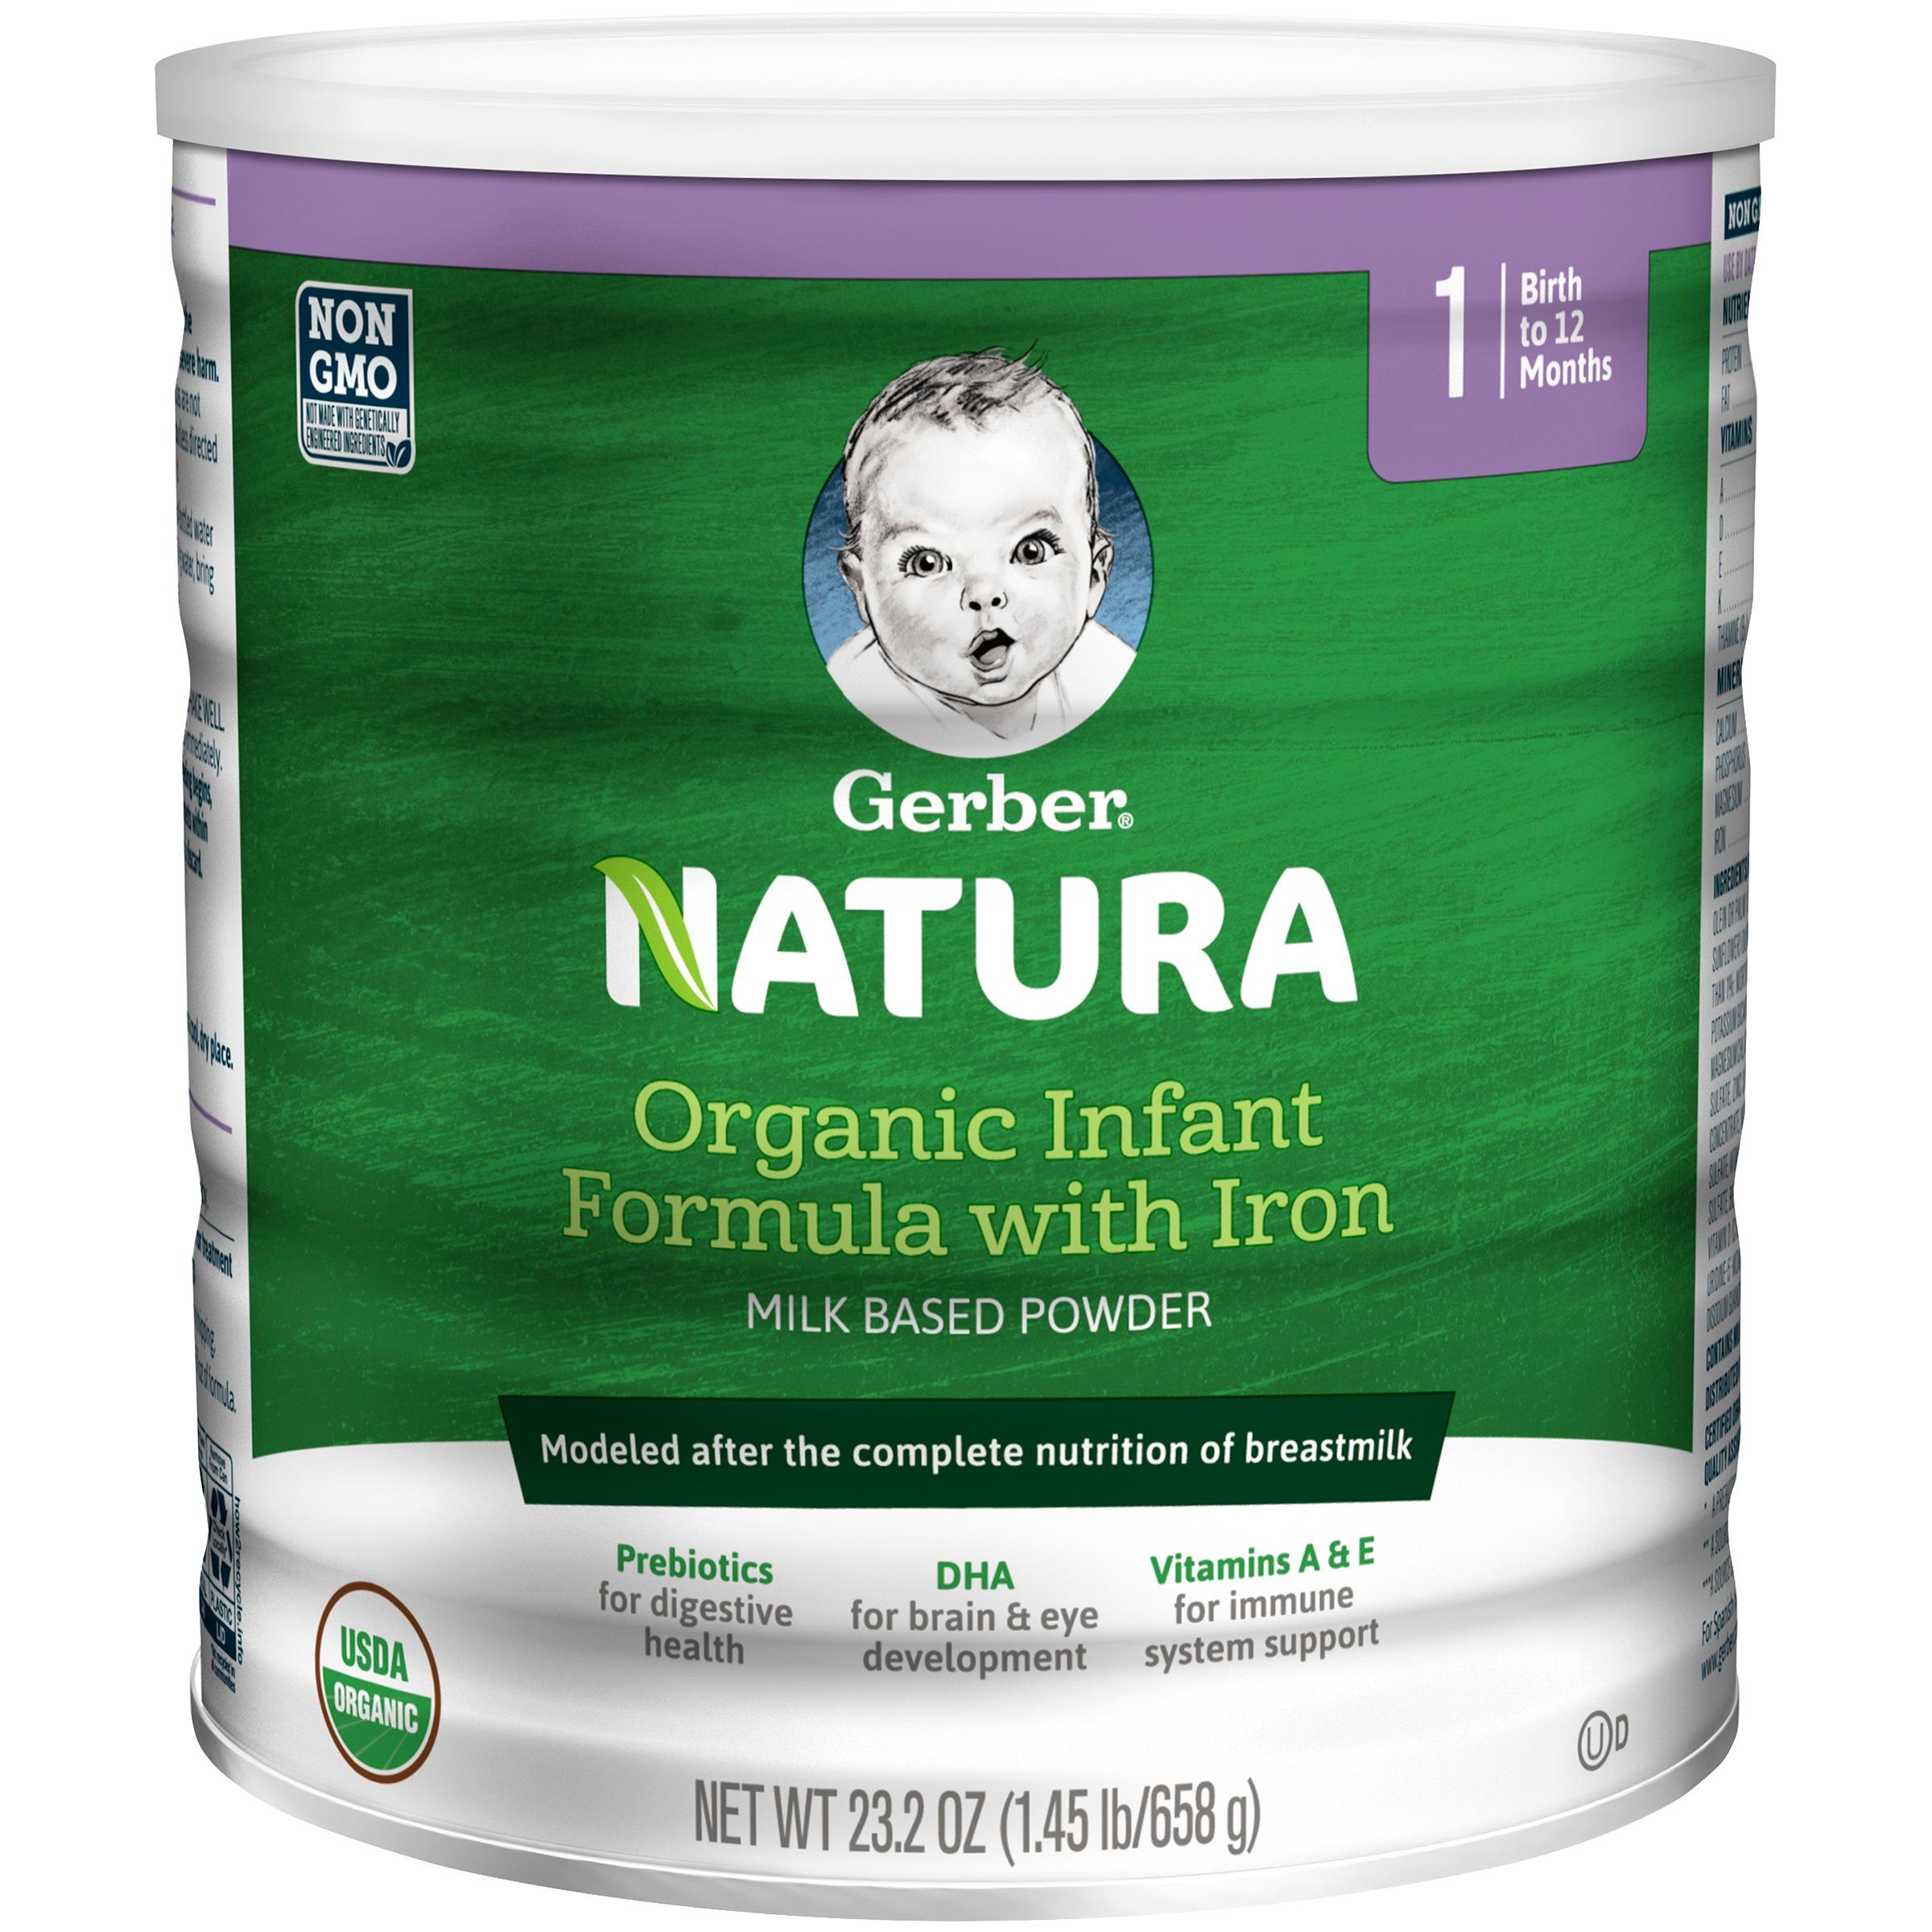 Gerber Natura Organic Powder Infant Formula, Stage 1, 23.2 oz